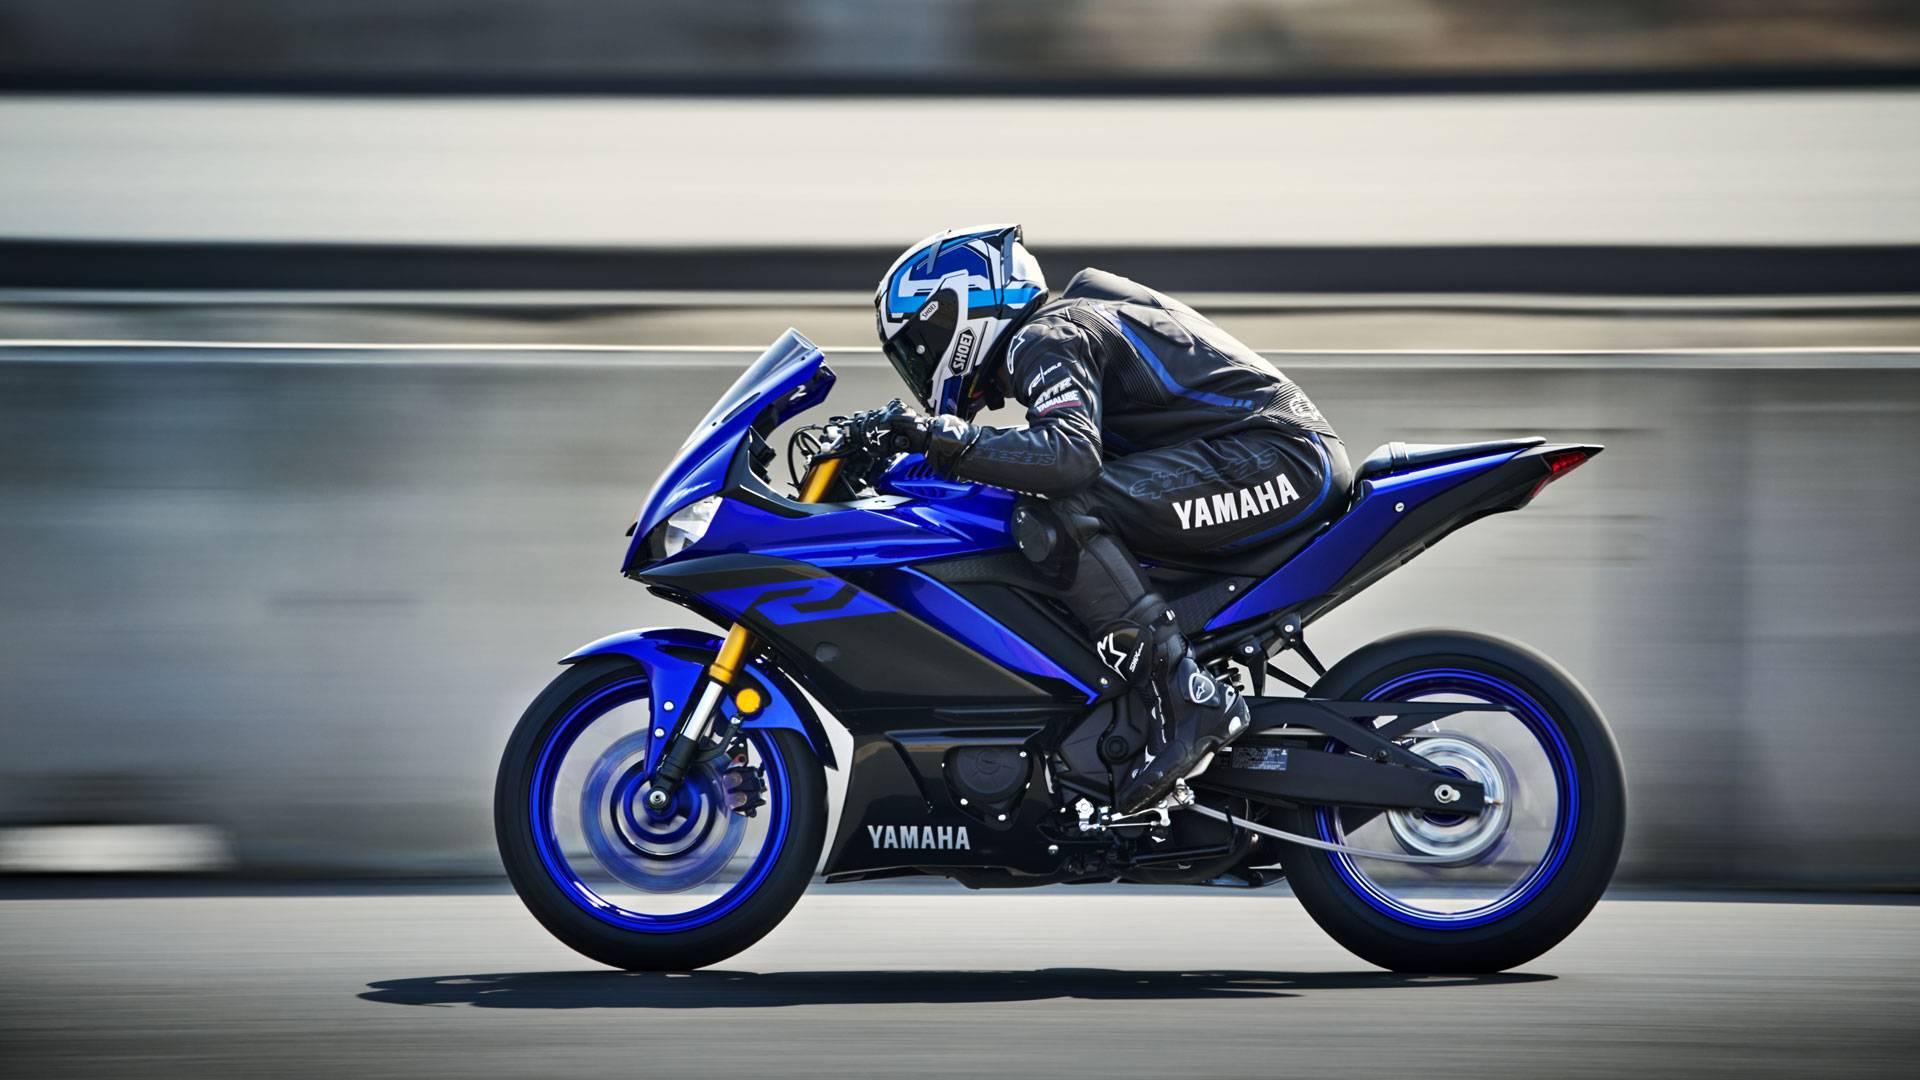 Yamaha prikazala redizajnirani R3 (galerija)